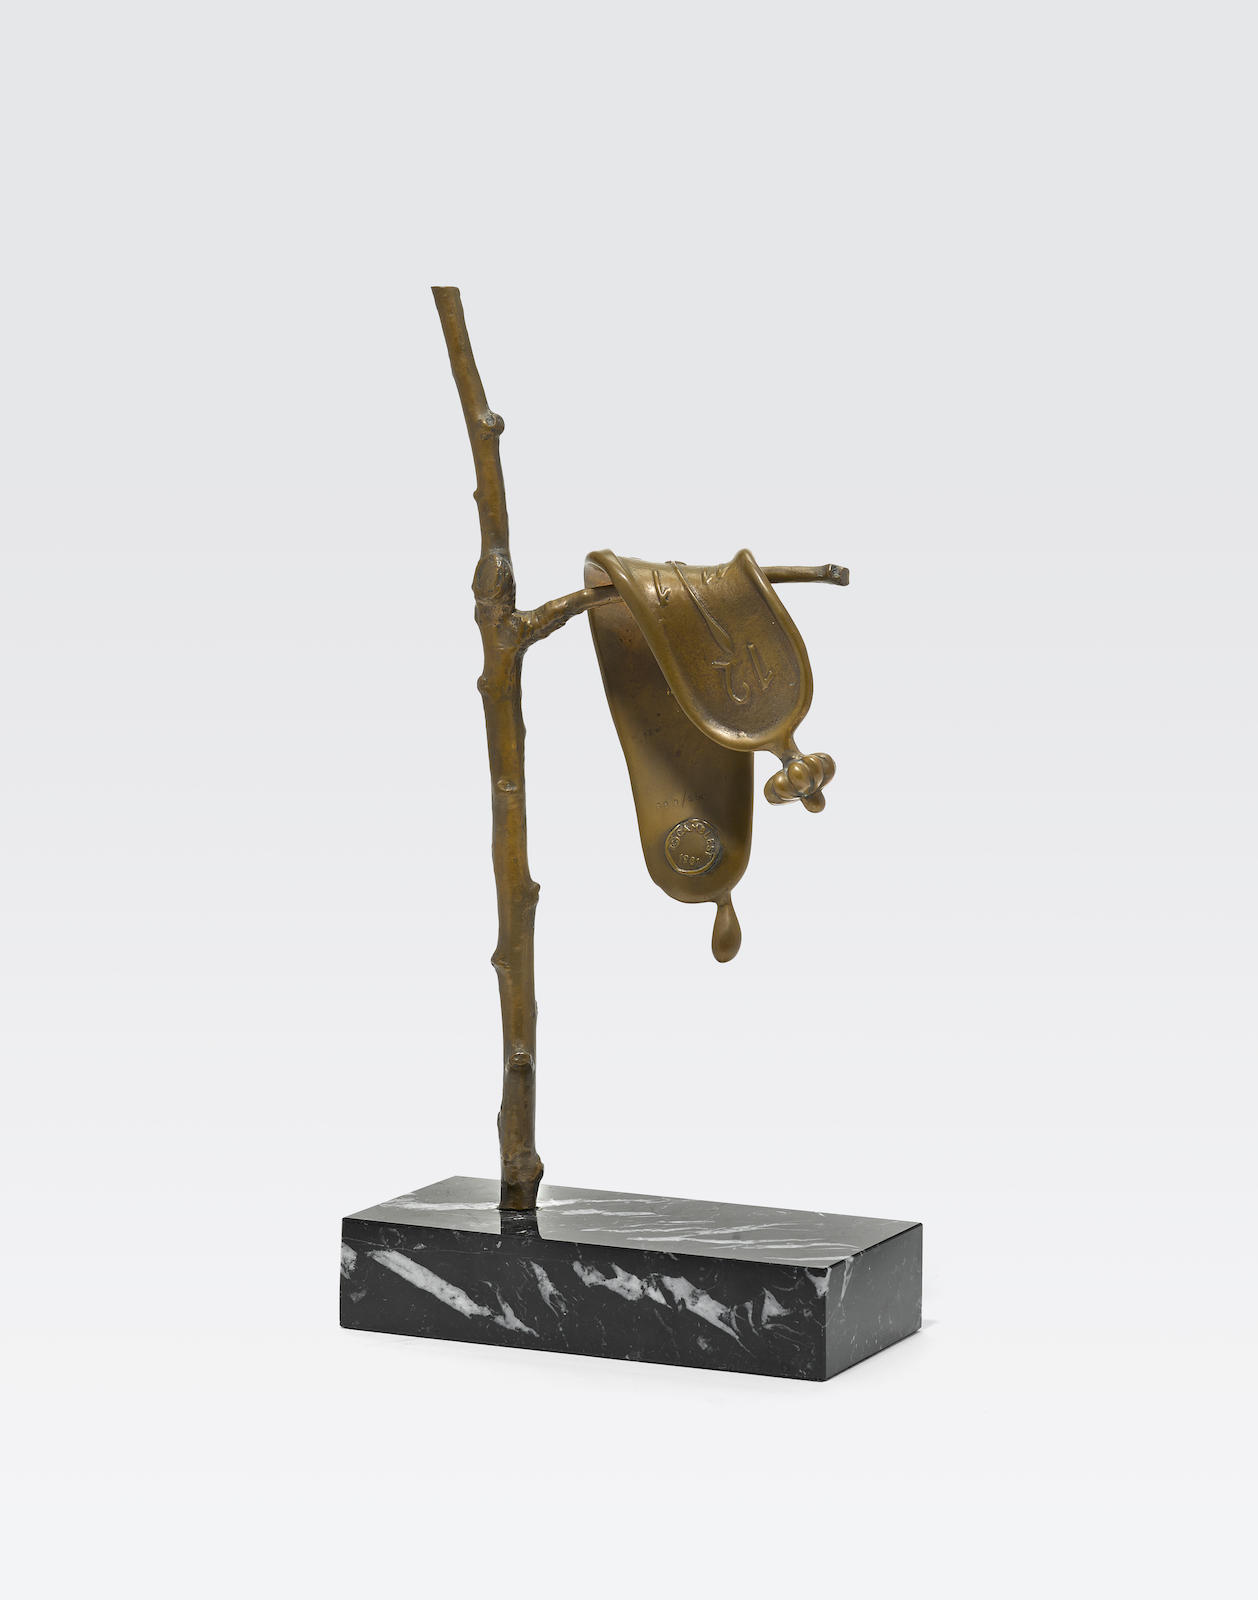 Salvador Dali-The Persistence of Memory, 1981-1981